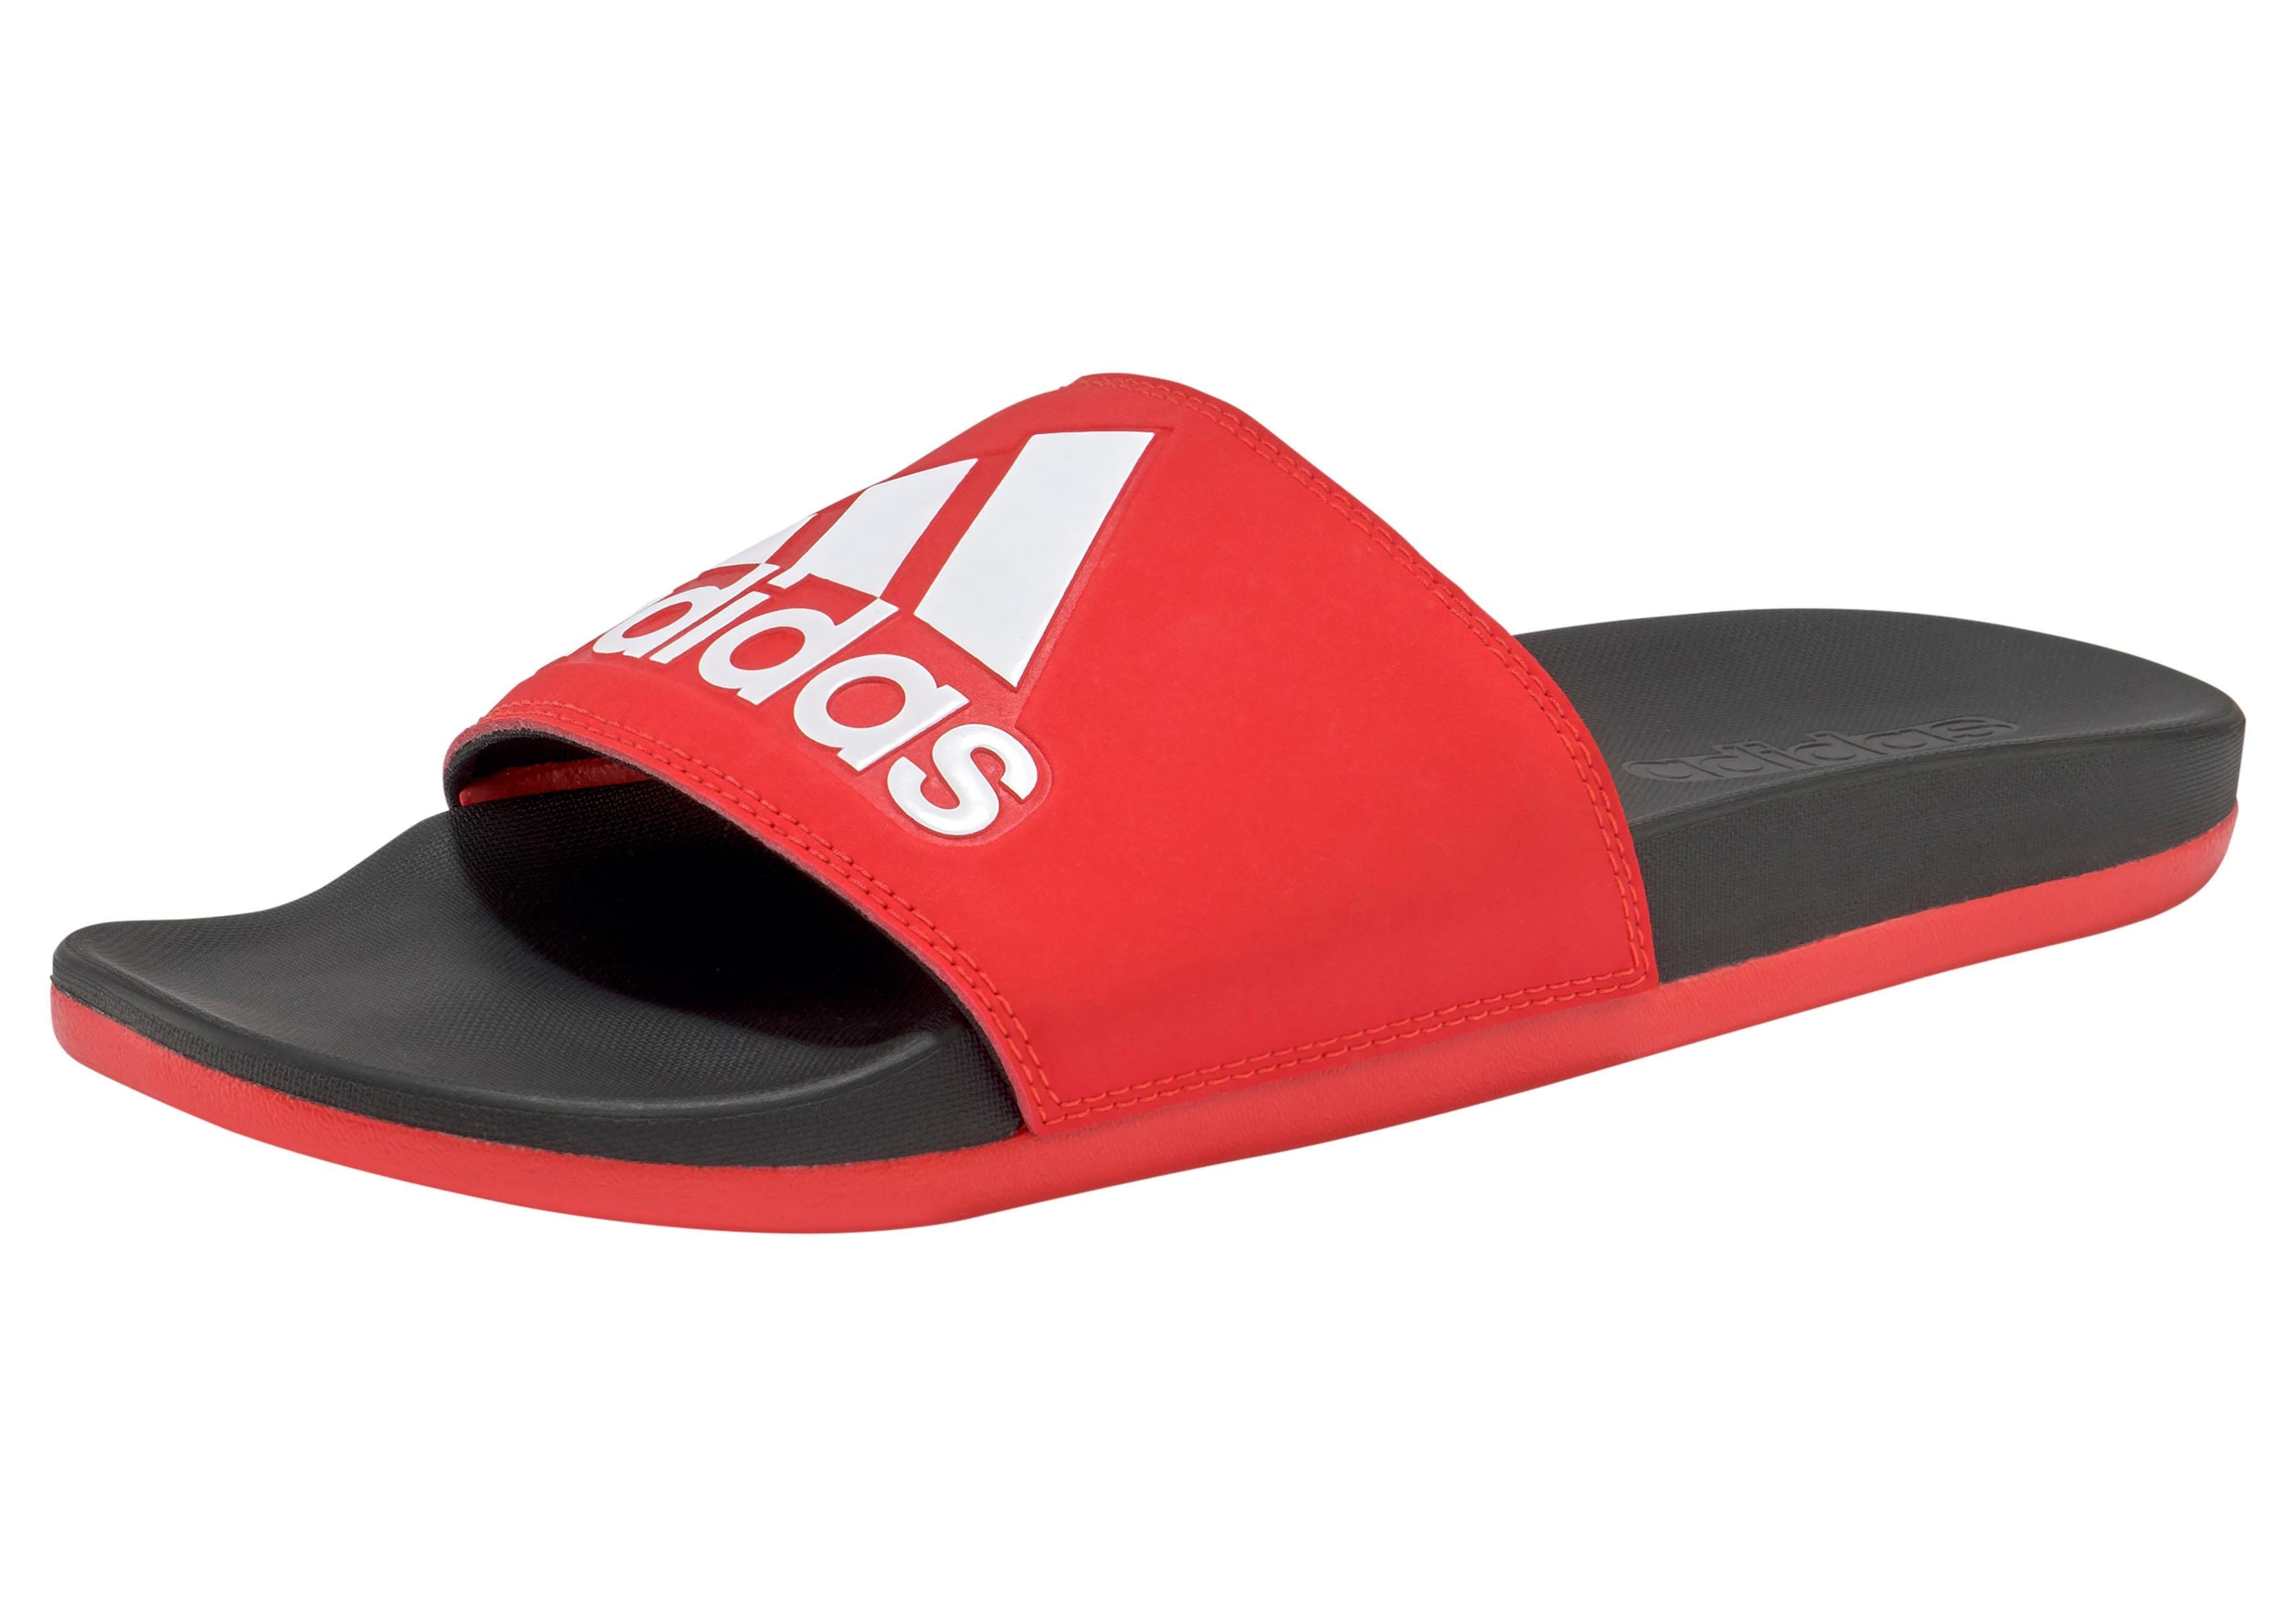 147bb36b0da ... adidas Performance badslippers »Adilette Comfort«, adidas Performance  badslippers »Adilette Comfort«, adidas Performance badslippers »Adilette  Comfort«